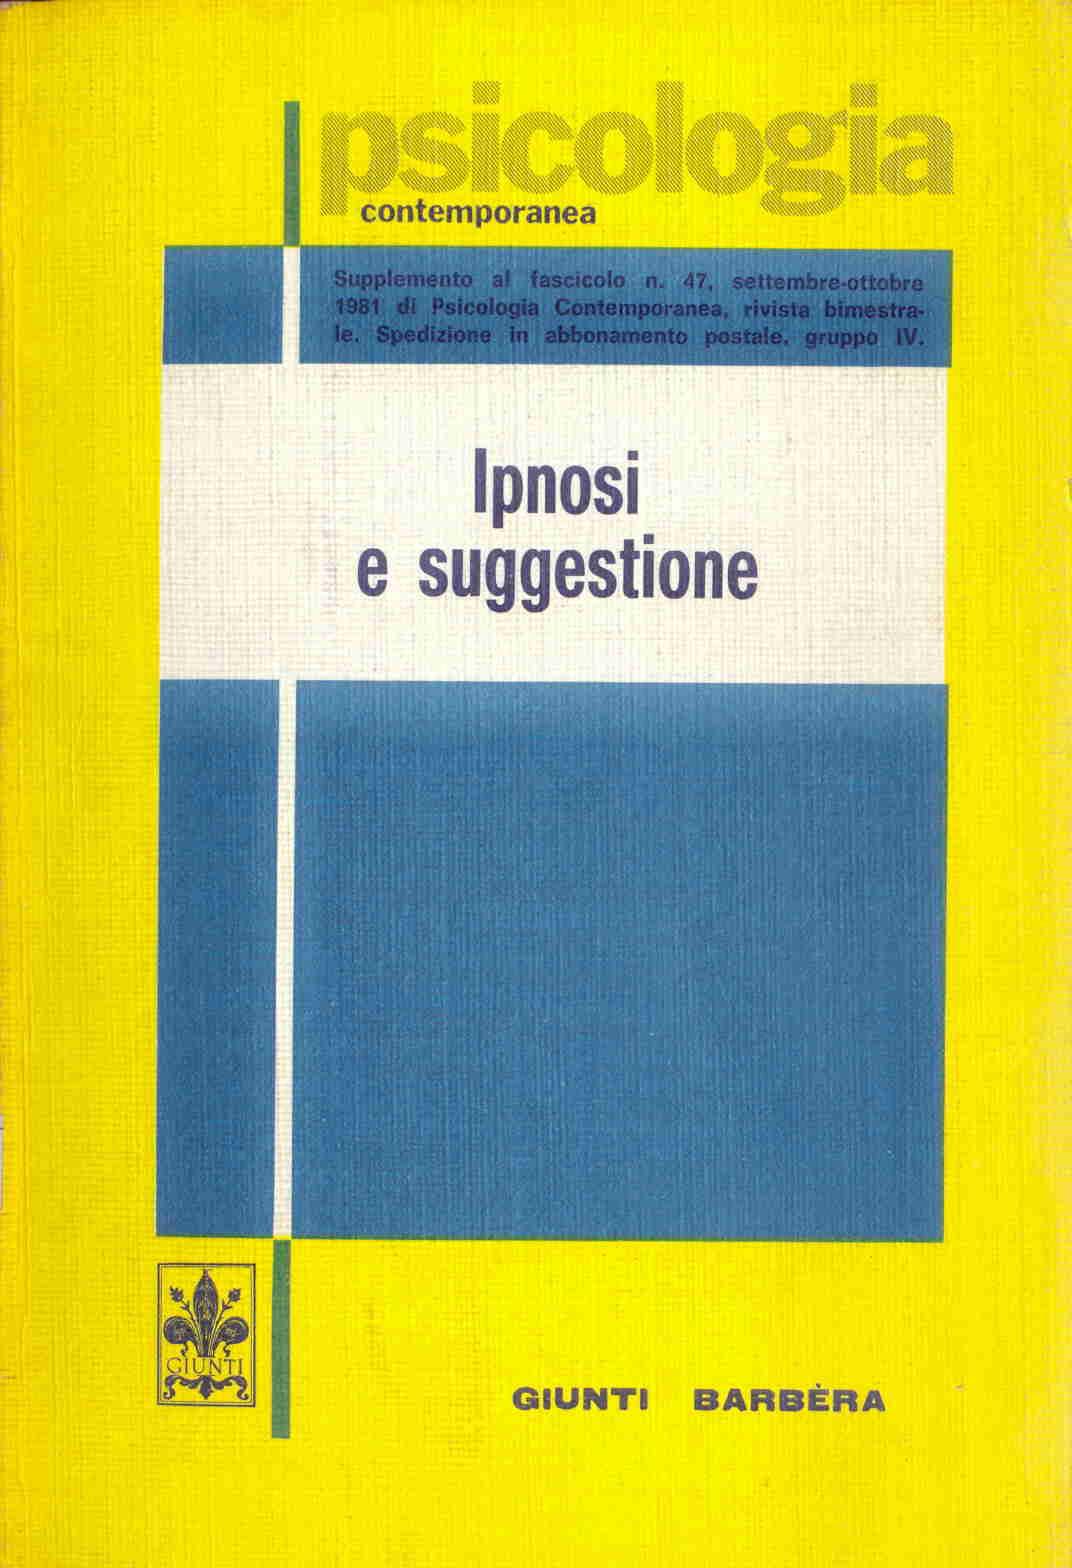 Ipnosi e suggestione